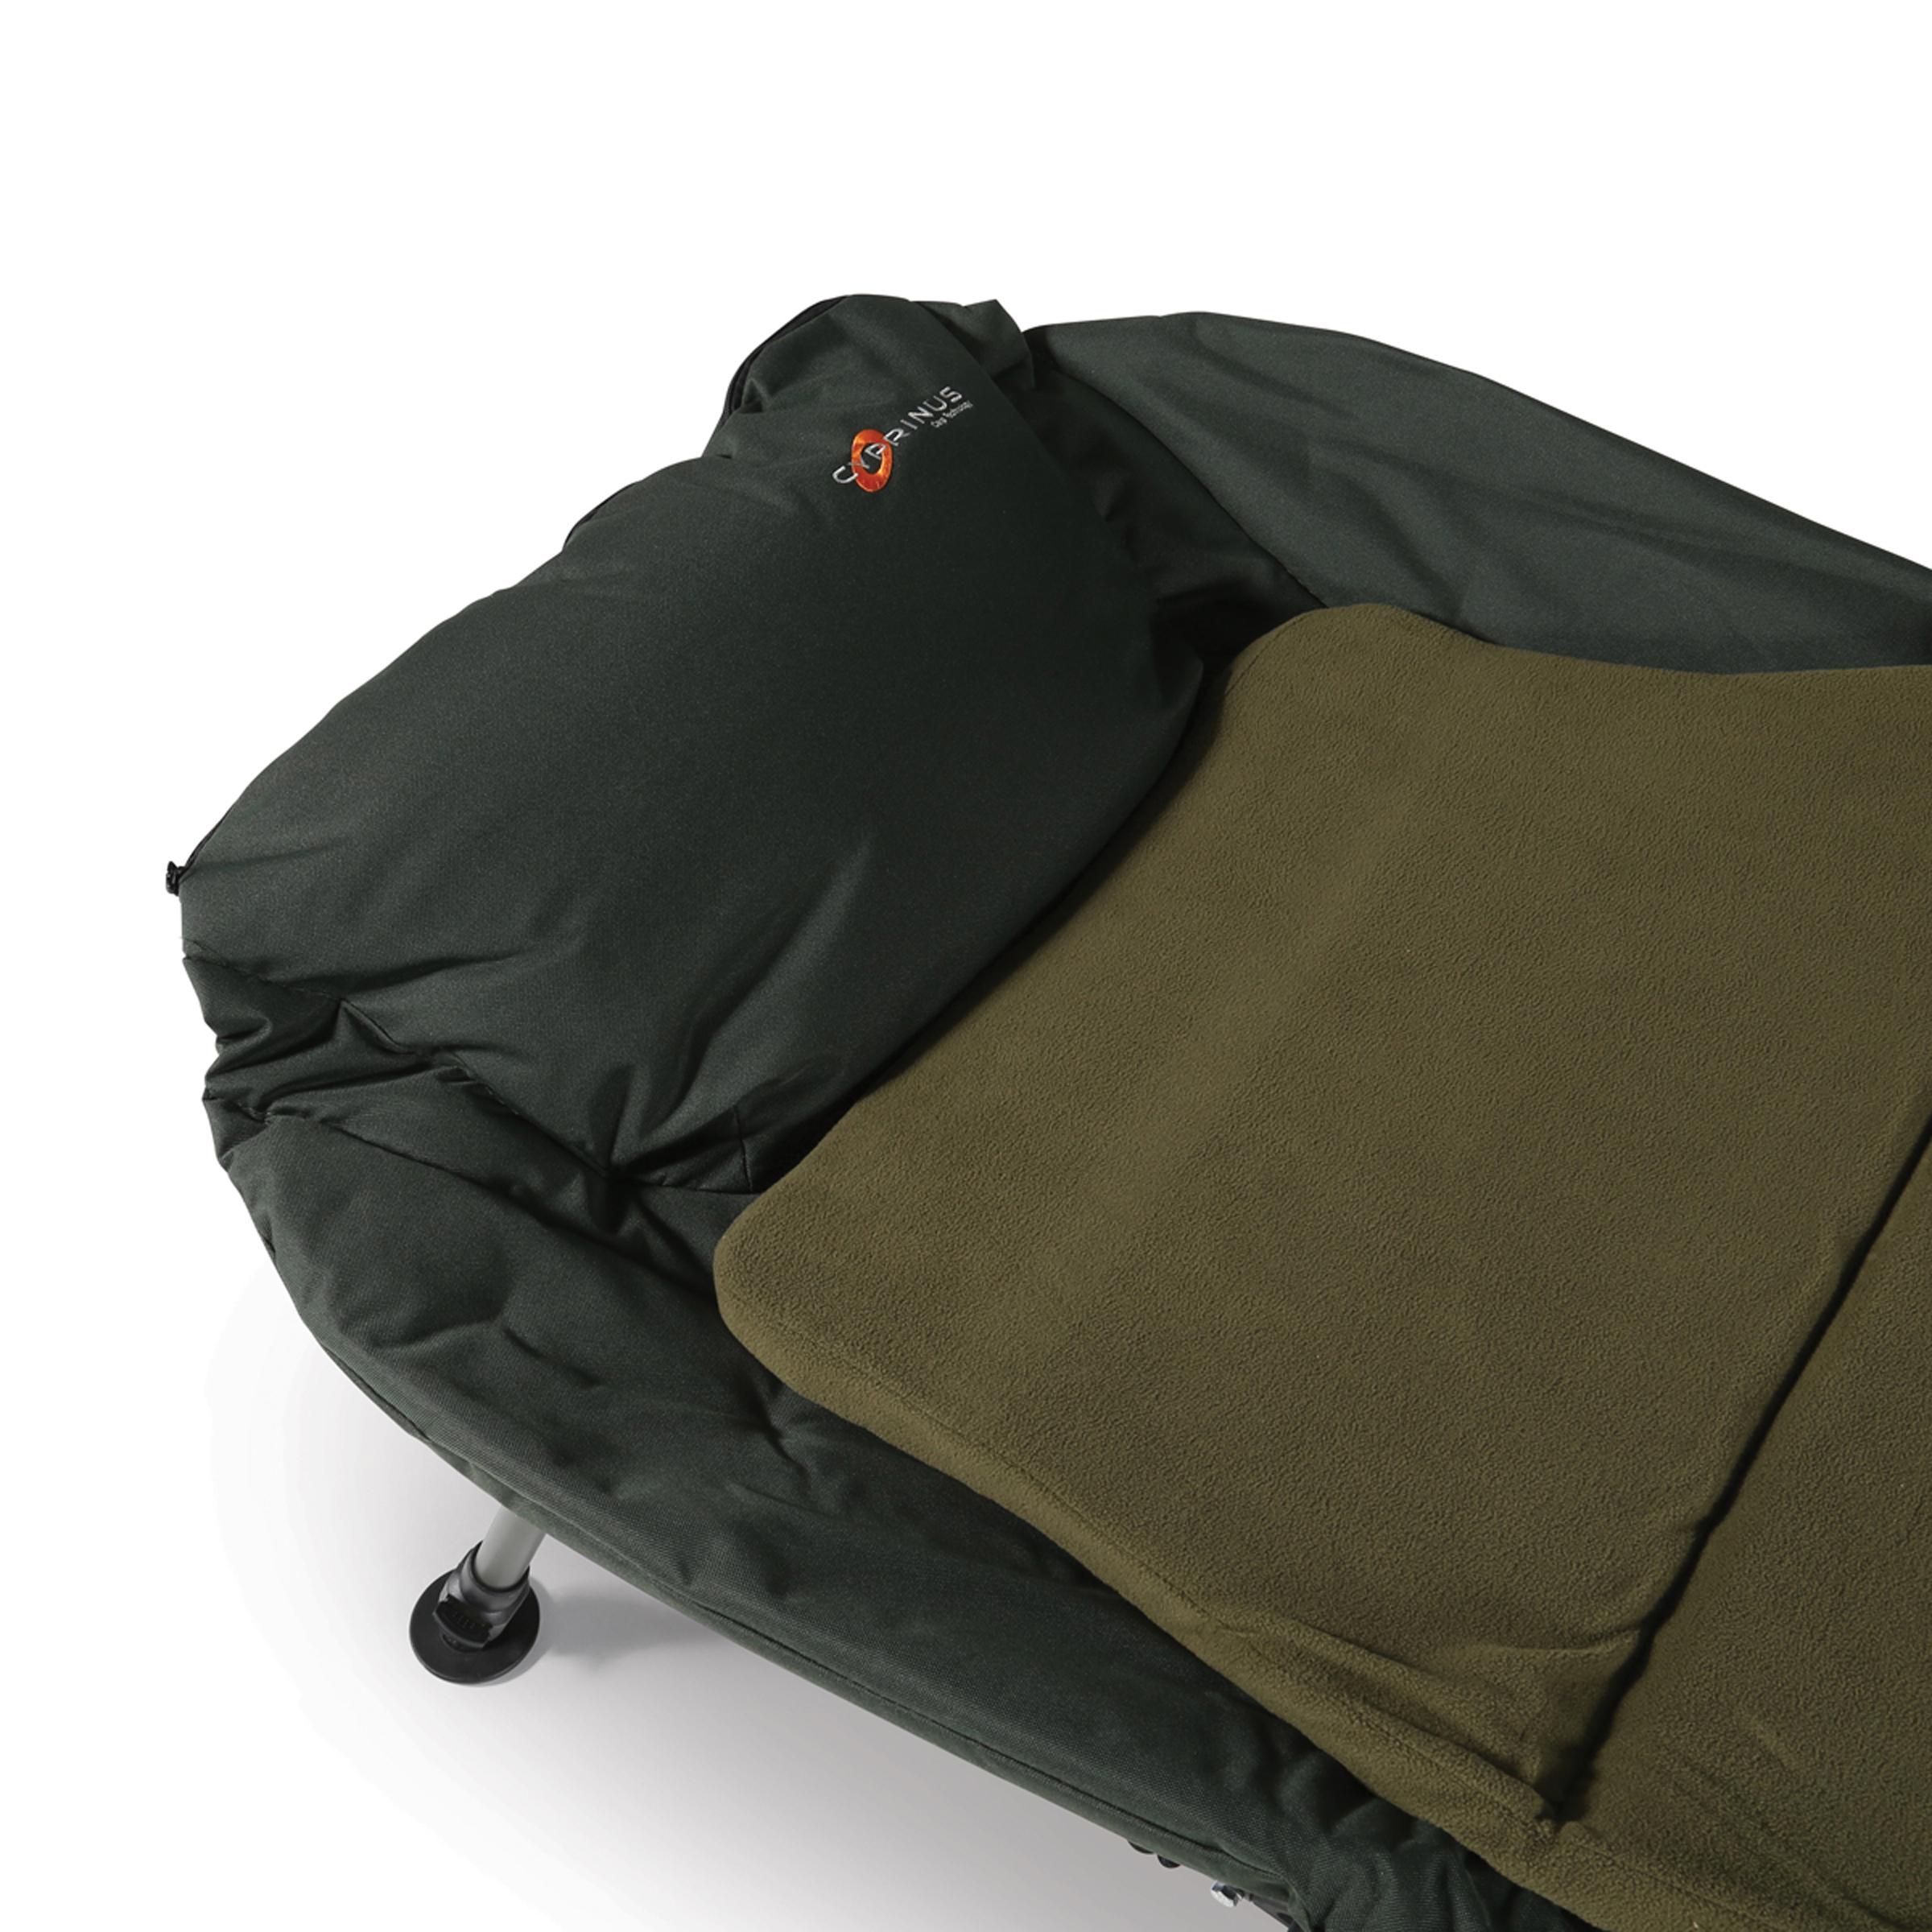 memory foam chair bed uk folding boat chairs cyprinus cyprimax 6 leg carp fishing bedchair